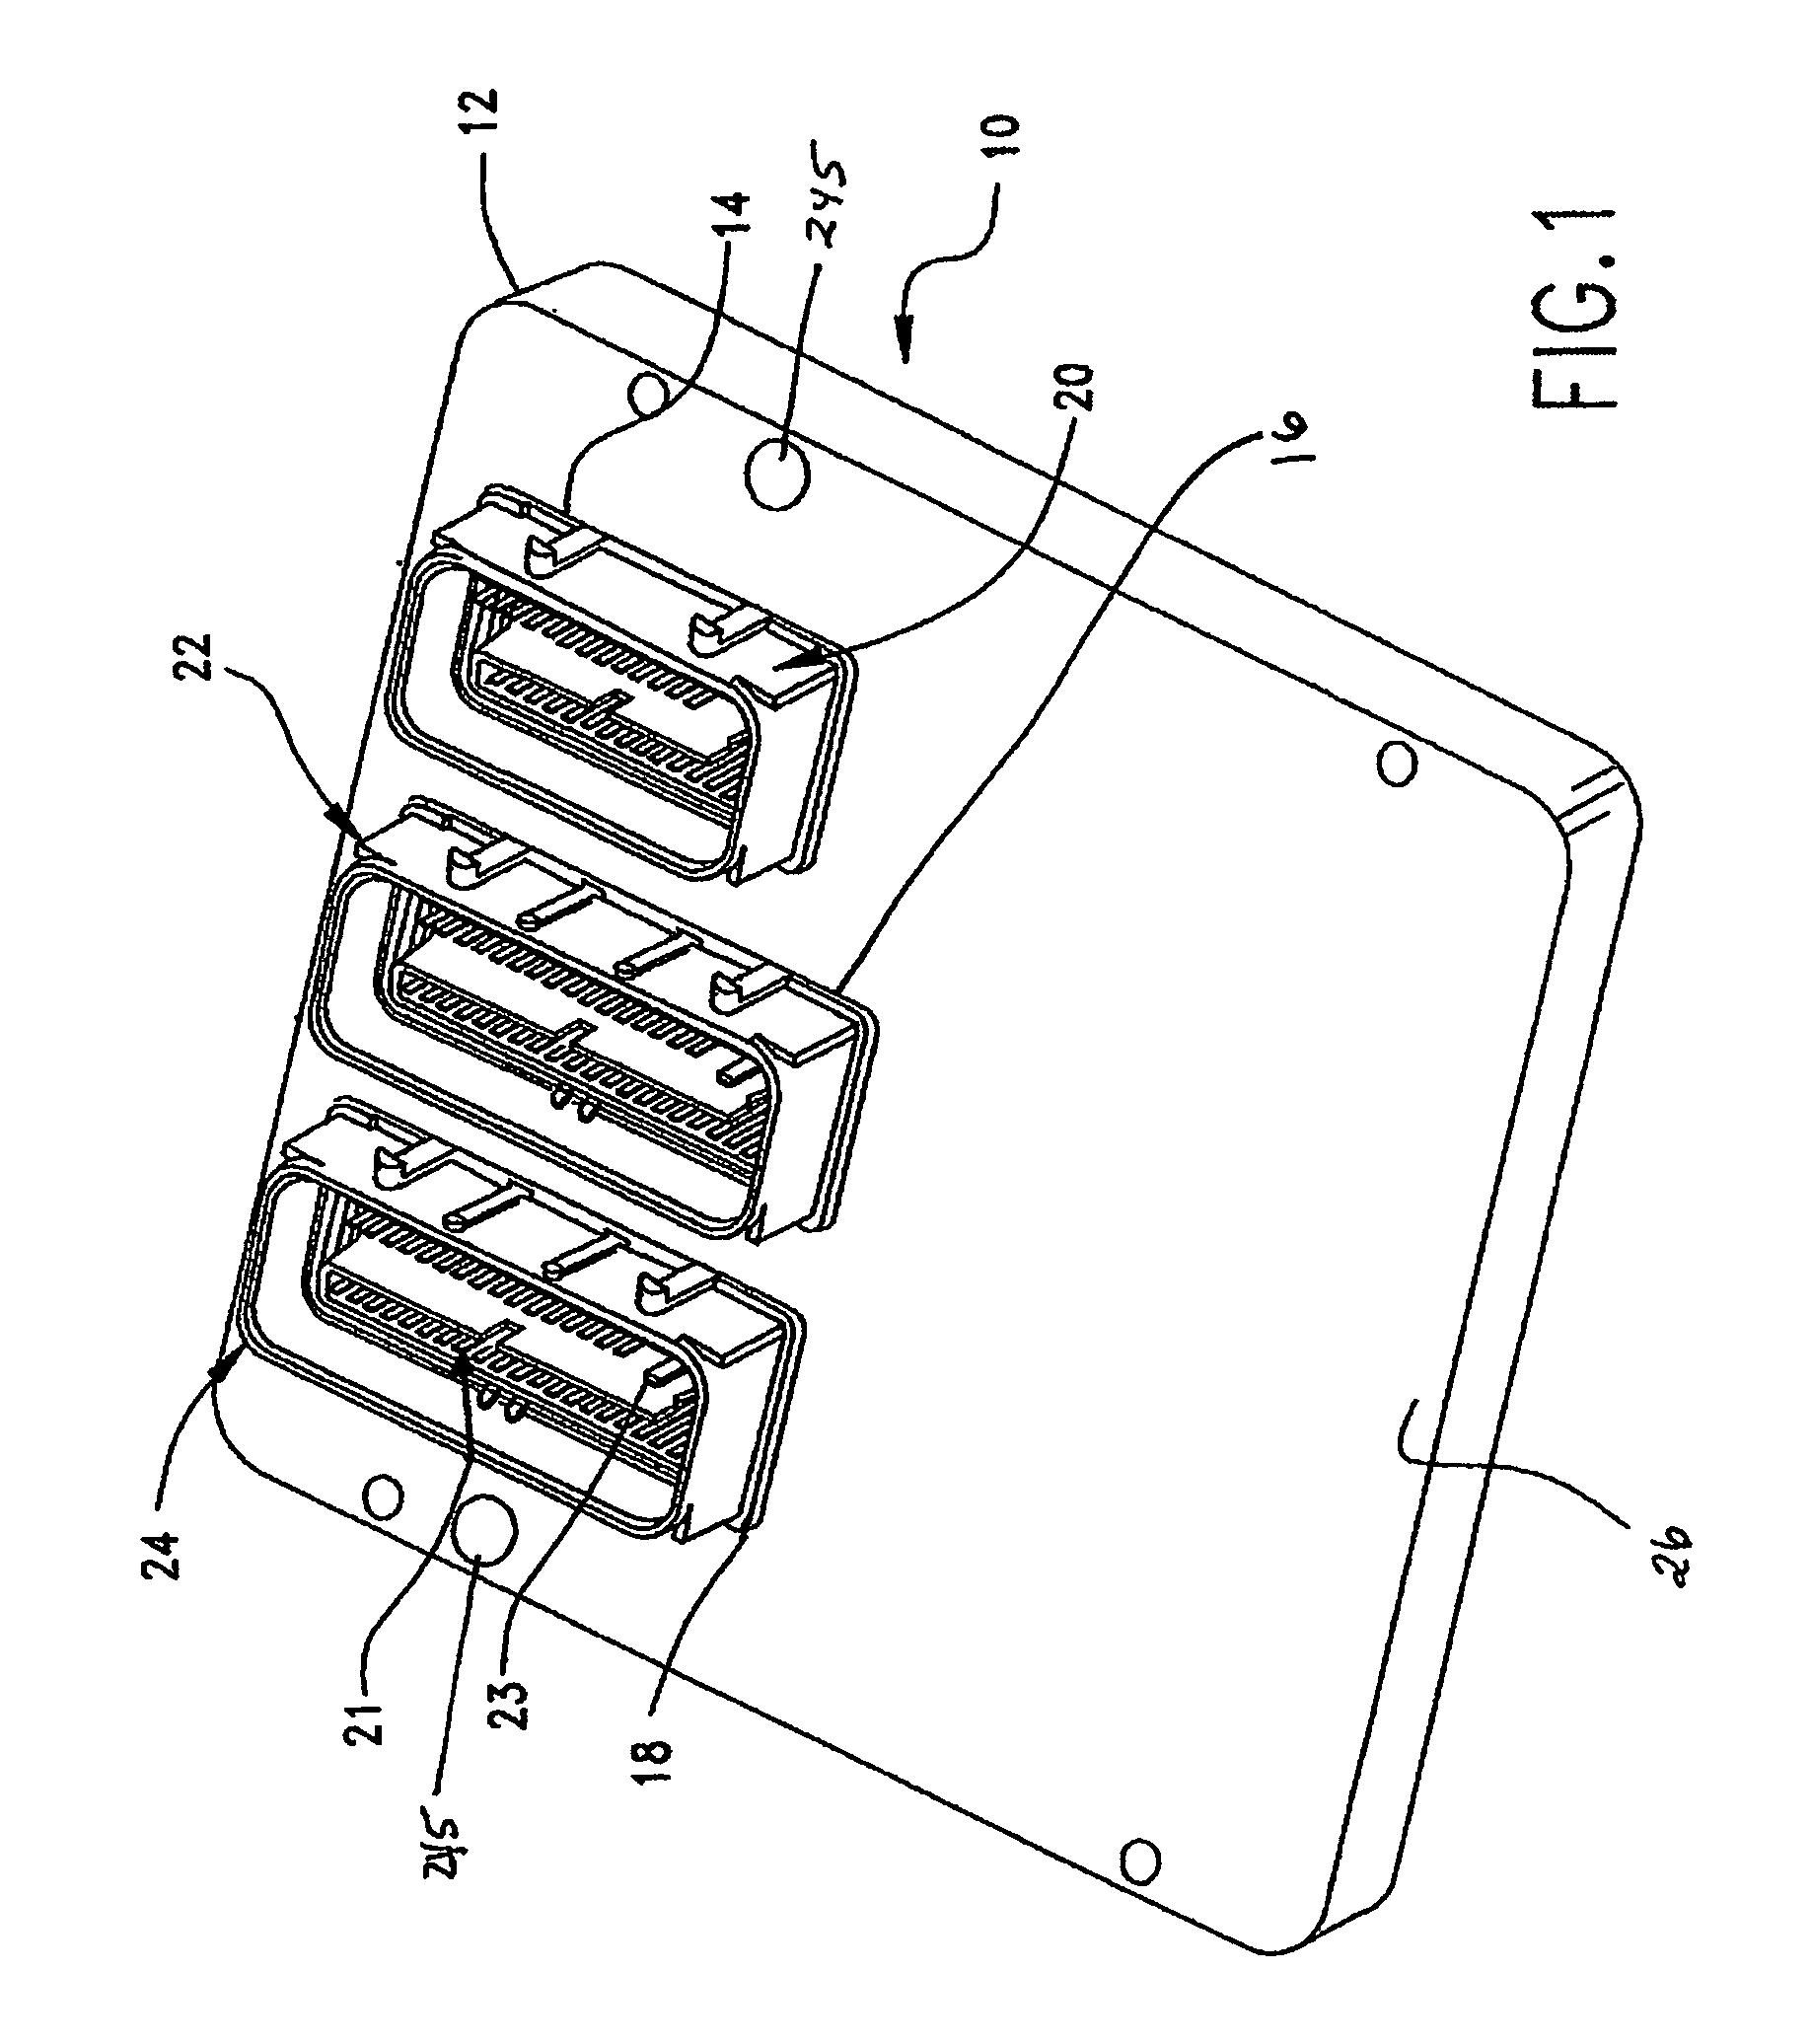 circuit board sealant